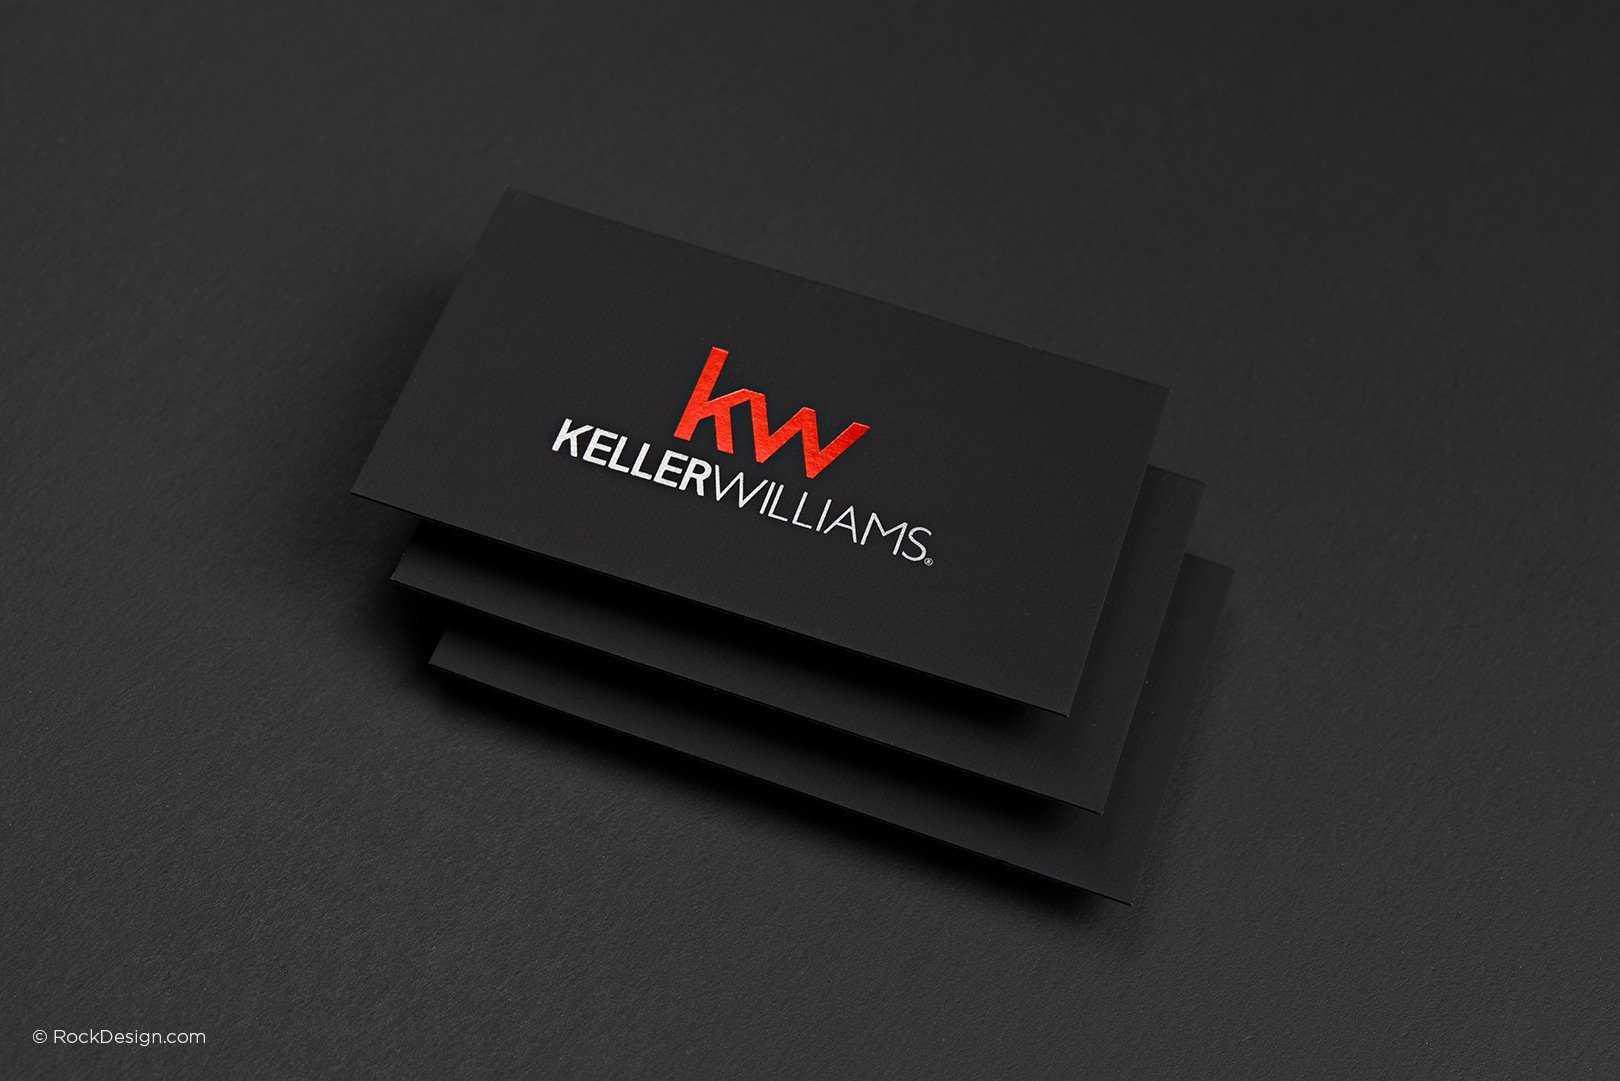 Free Keller Williams Business Card Template With Print Inside Keller Williams Business Card Templates